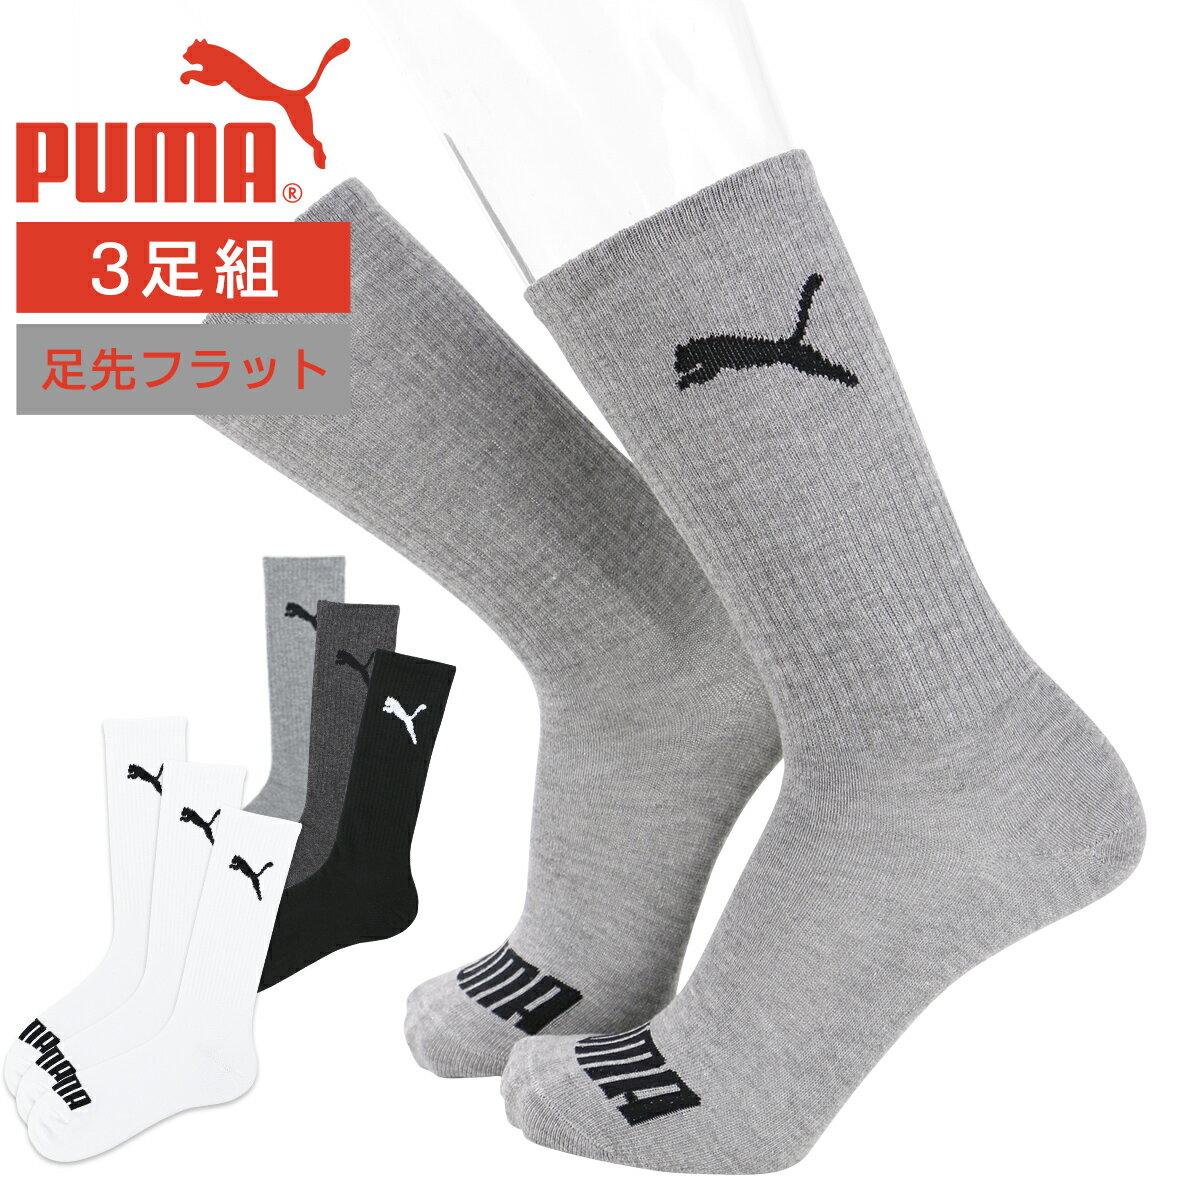 PUMA ( プーマ ) メンズ 靴下 足先フラット ワンポイント・3足組クルー丈 ソックス 男性 メンズ プレゼント 贈答 ギフト2822-411ポイント10倍